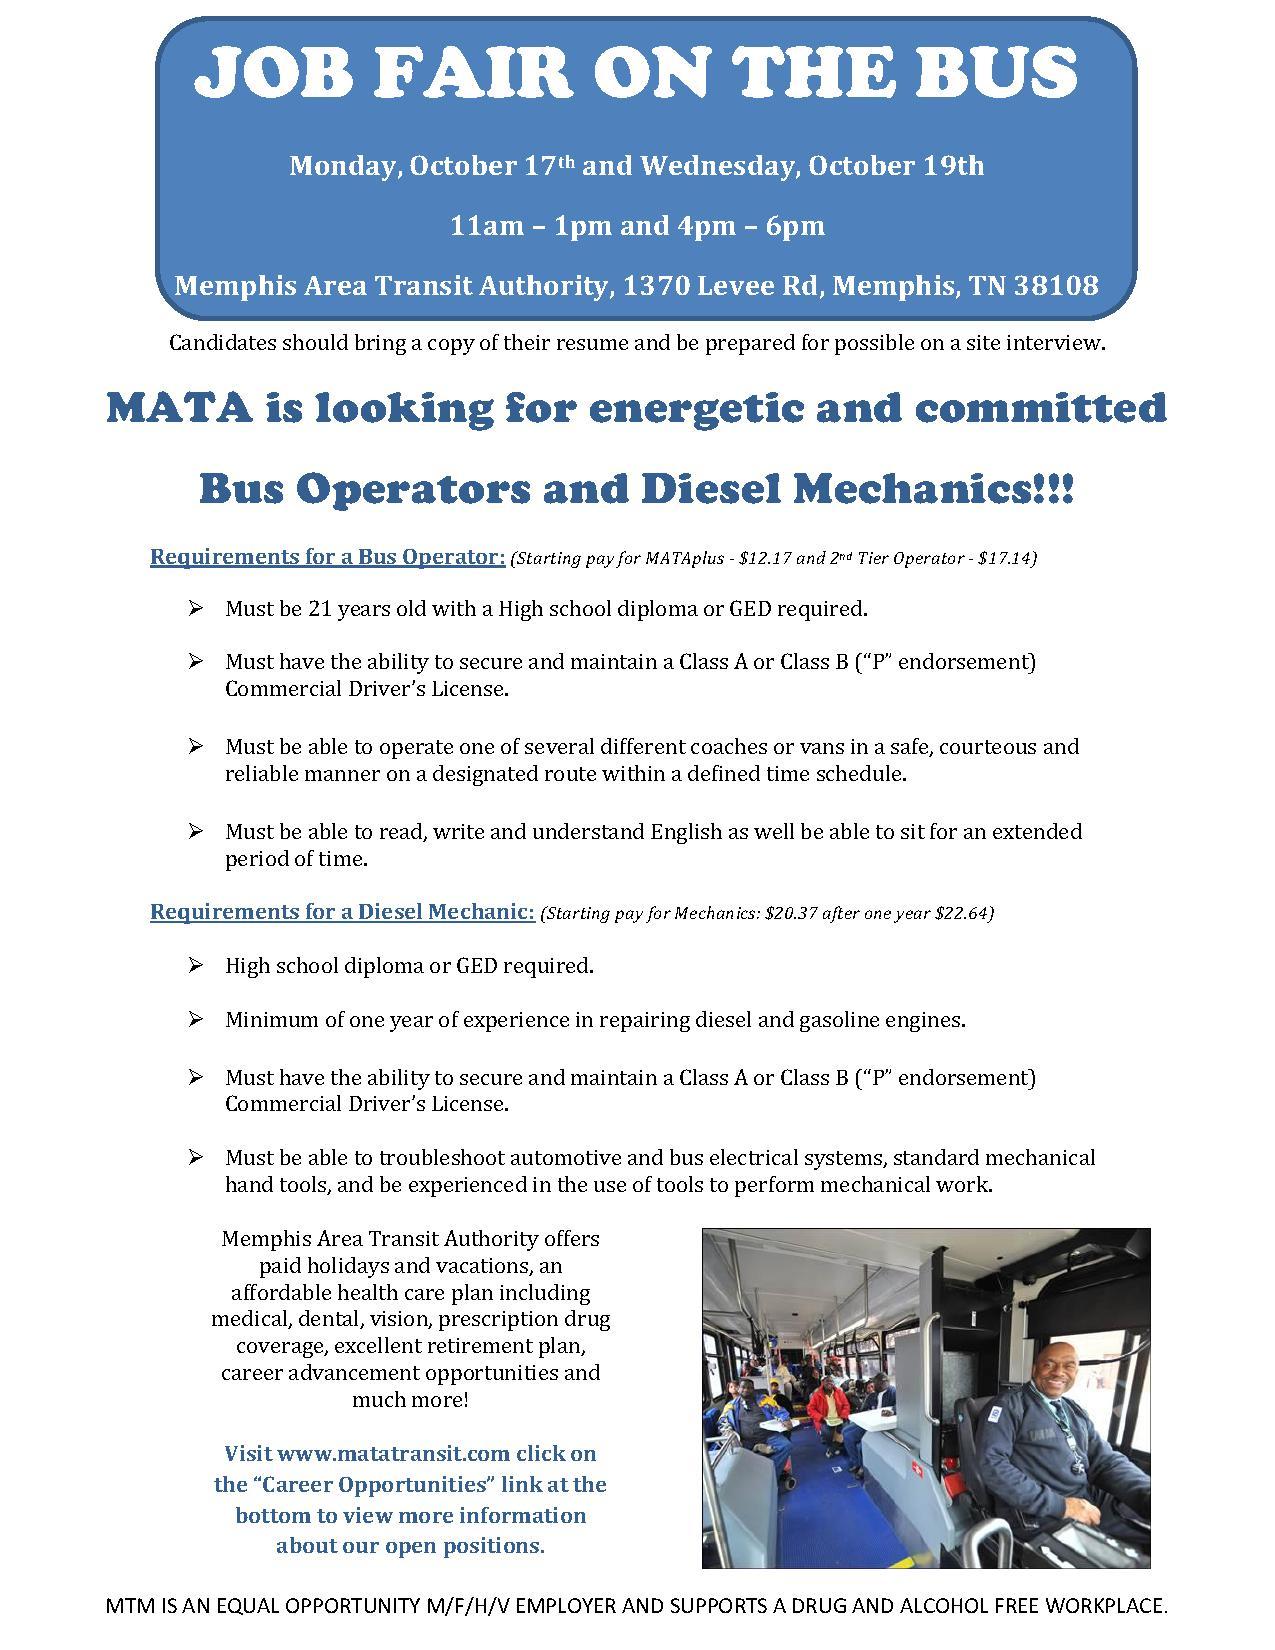 mata-job-fair-flyer_1